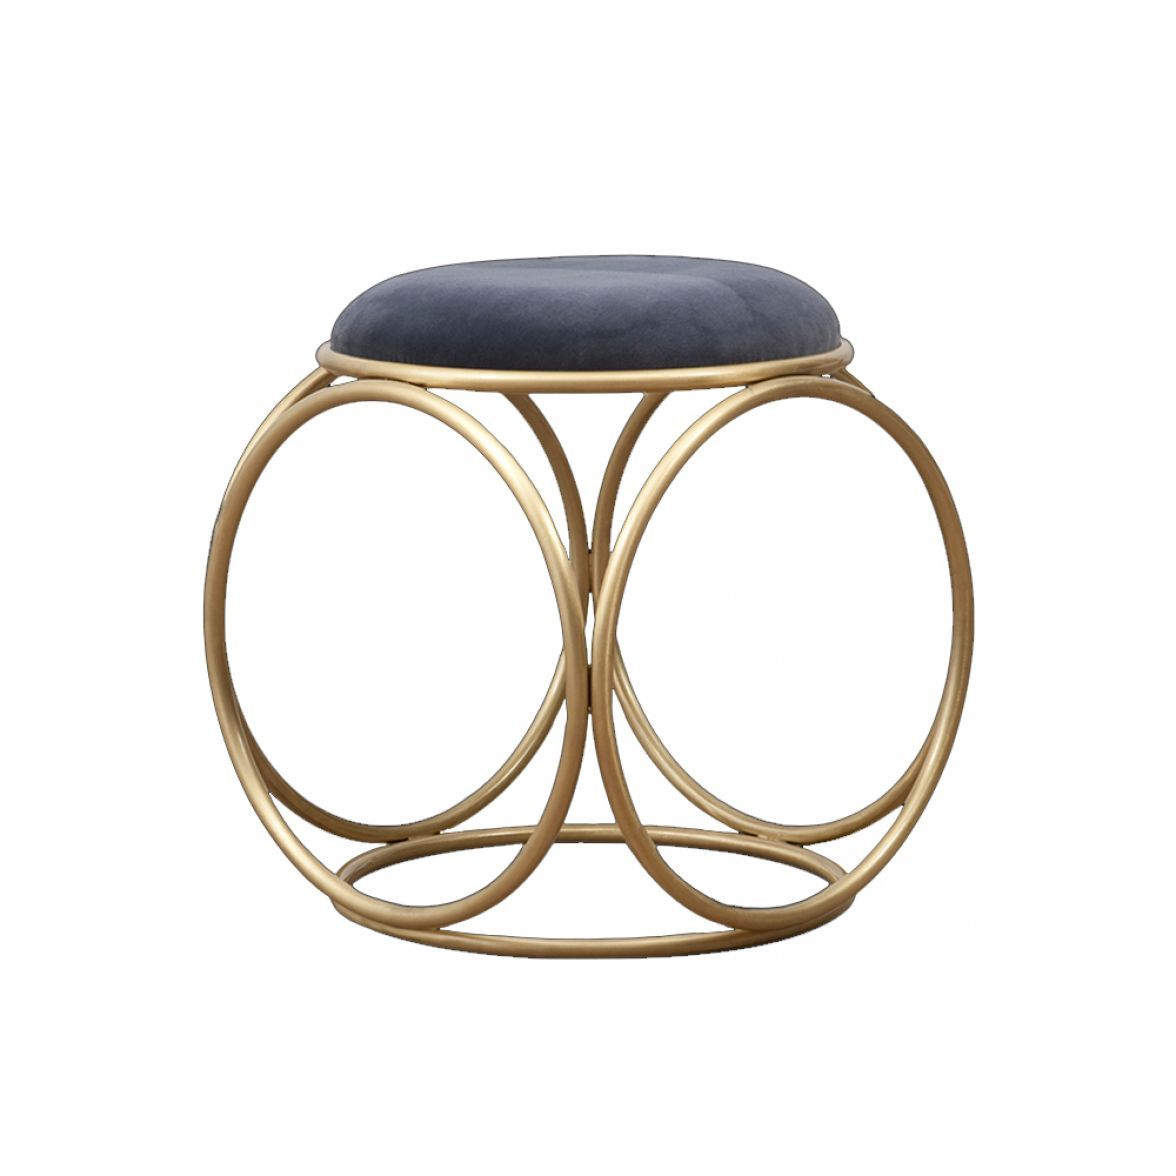 BRASS RINGS stool